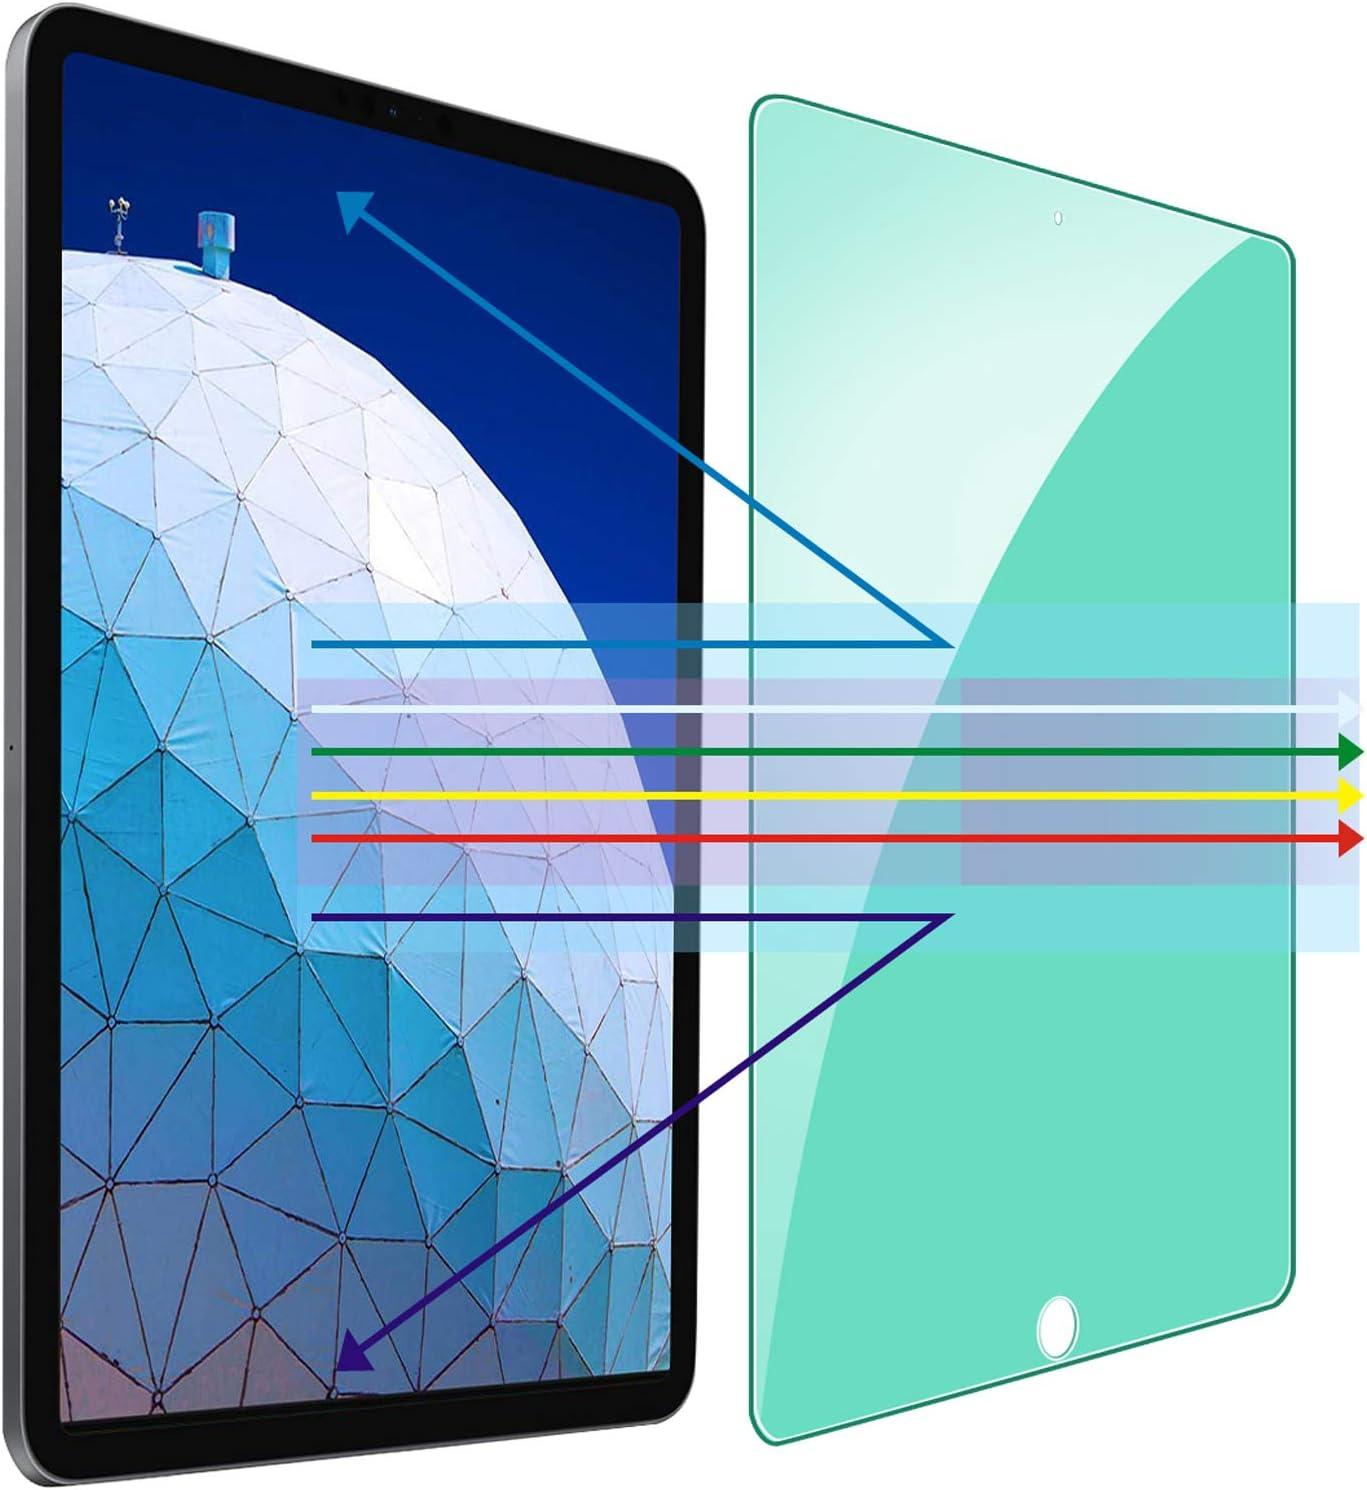 【Eye Protection 】Tiietone Green Light Eye Protection Screen Protector for Mini 5 2019 / iPad Mini 4 (7.9